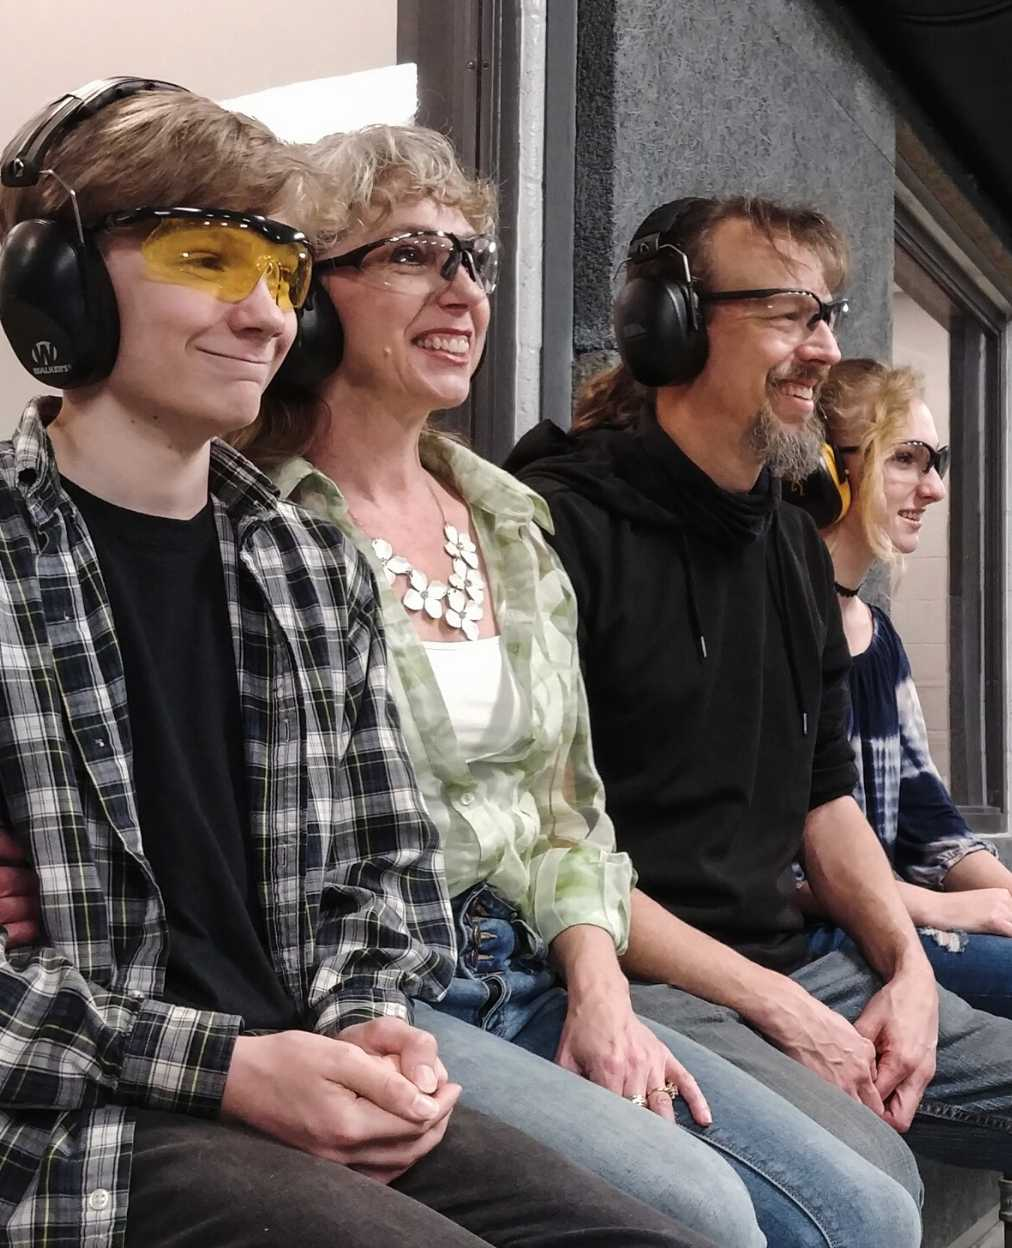 family-smiling-in-gun-range